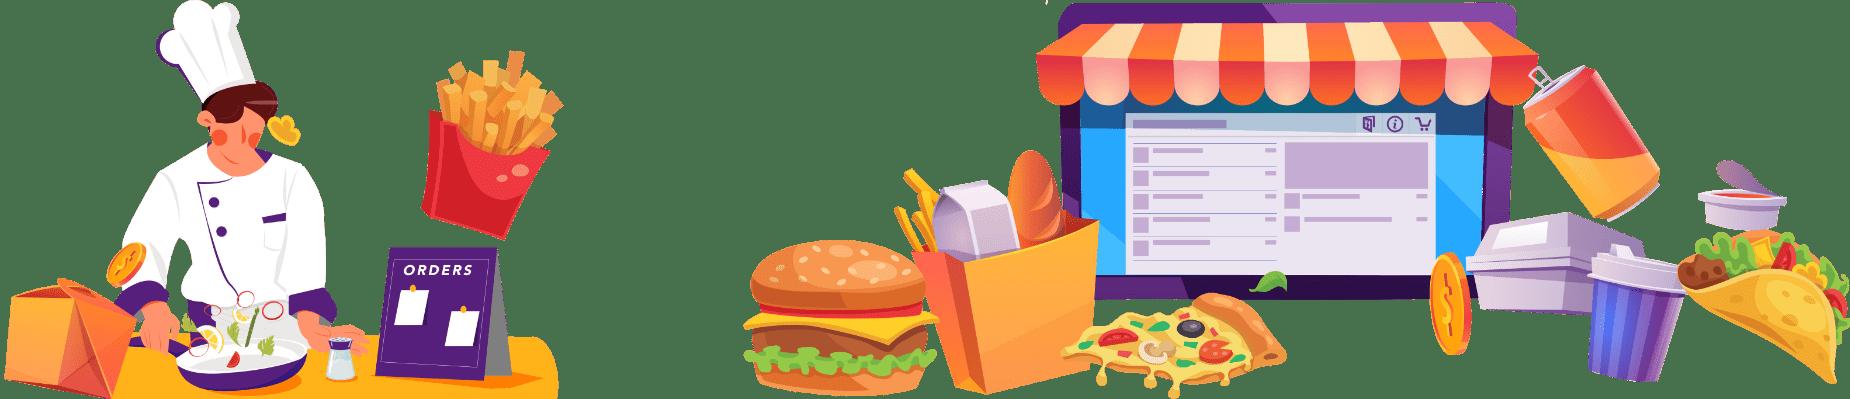 background menu food ordering storegear